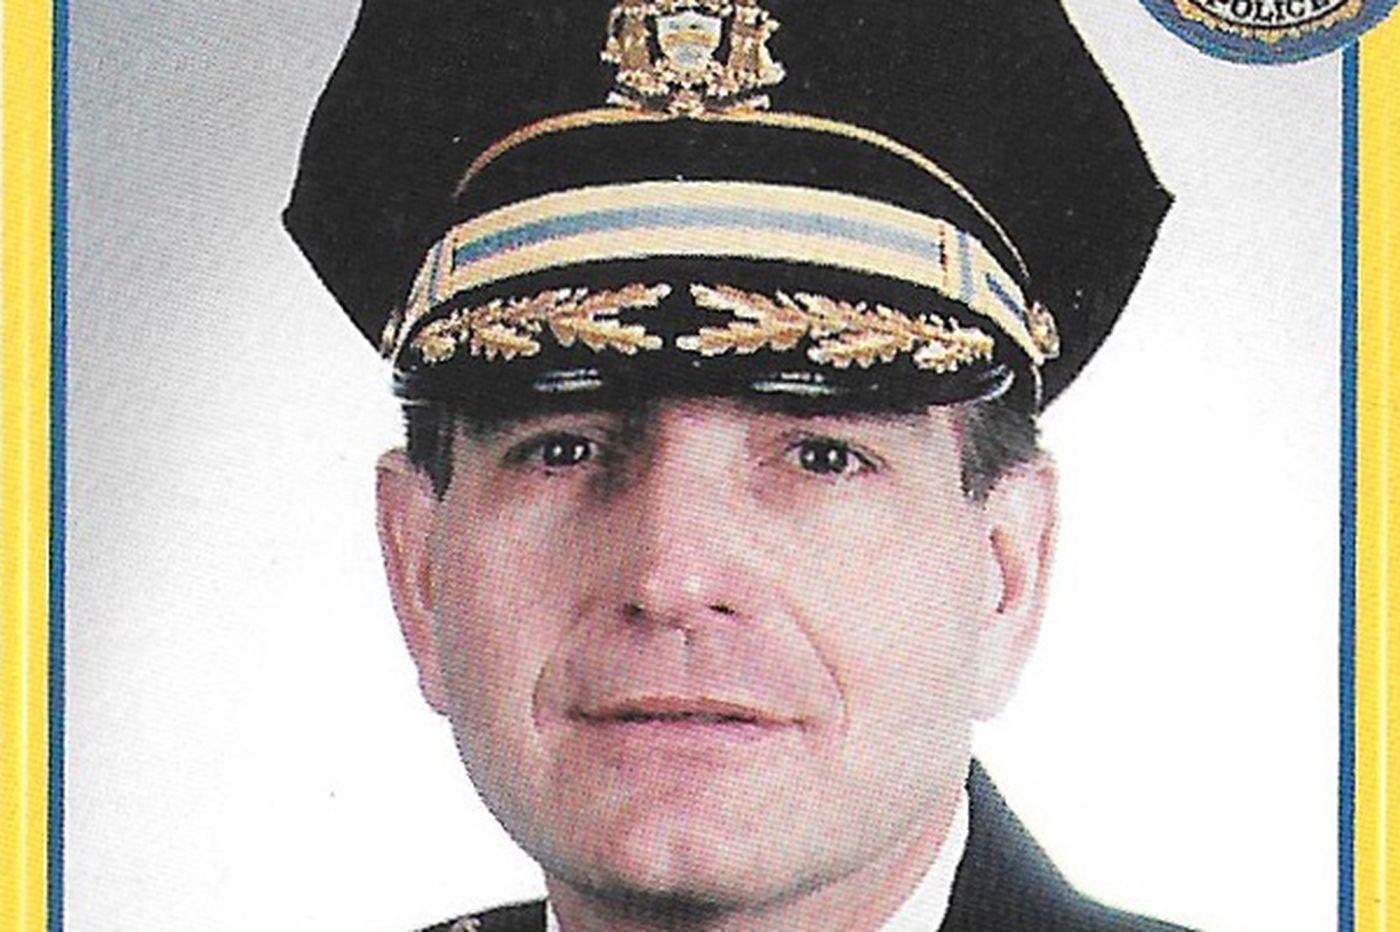 Richard Zappile, law enforcement veteran in Philadelphia